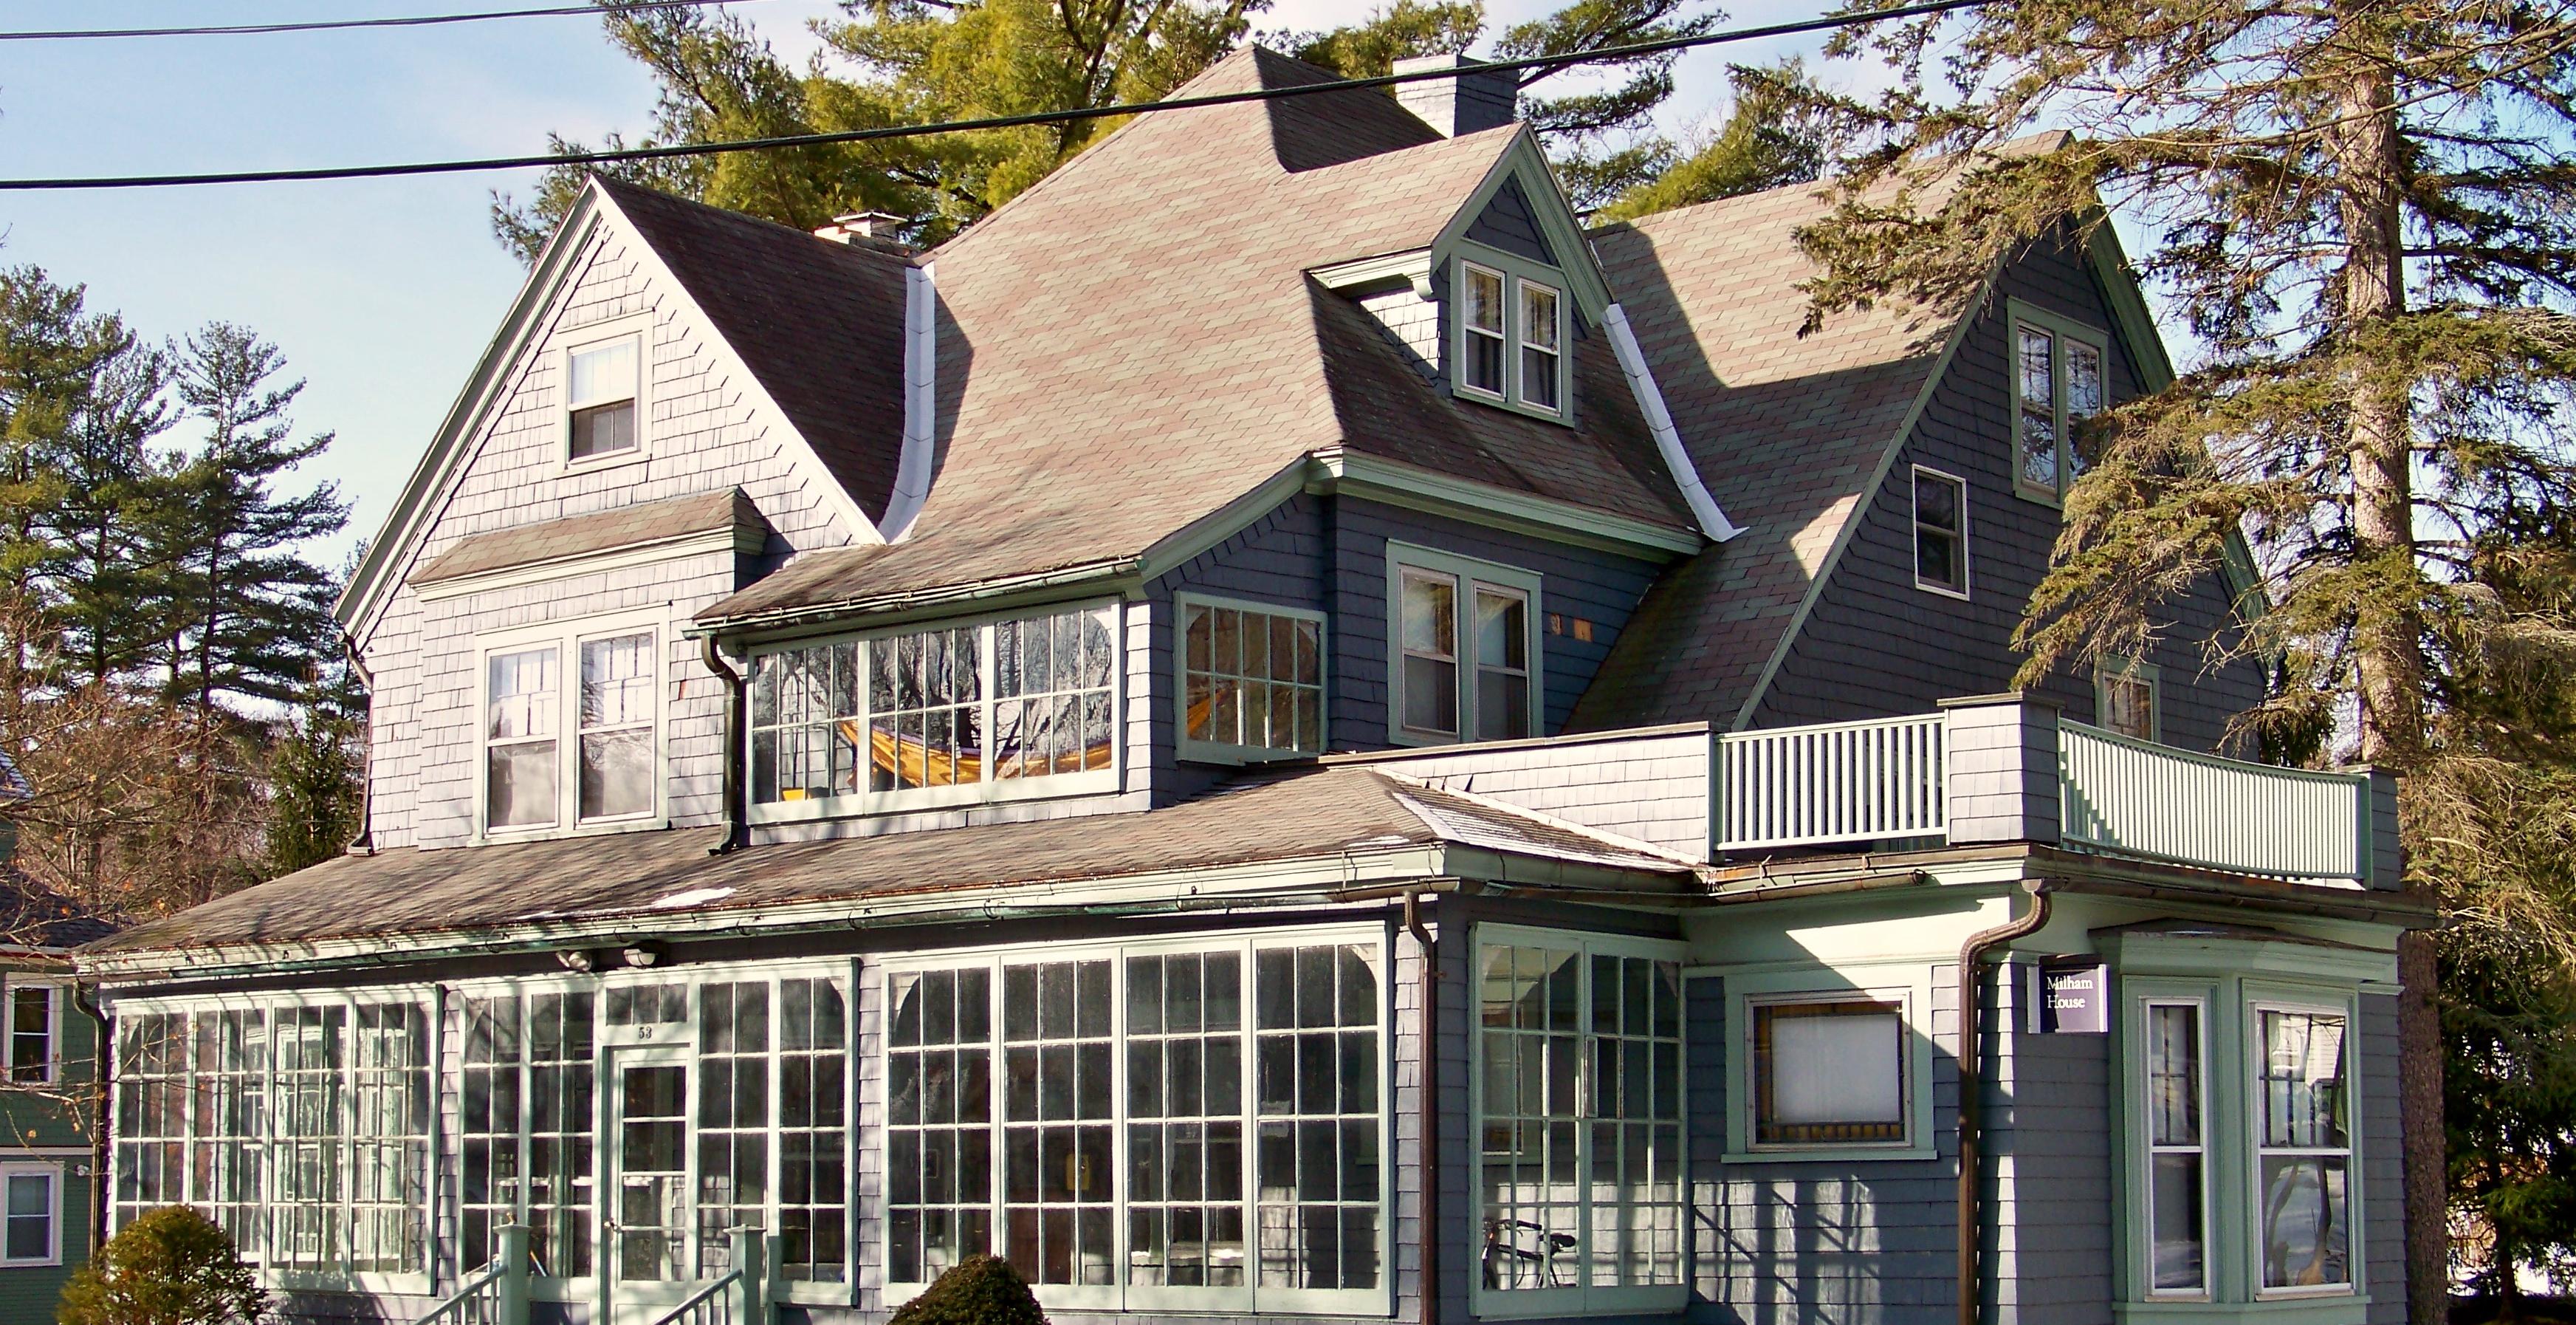 Co-Op Housing for Seniors – Student Life